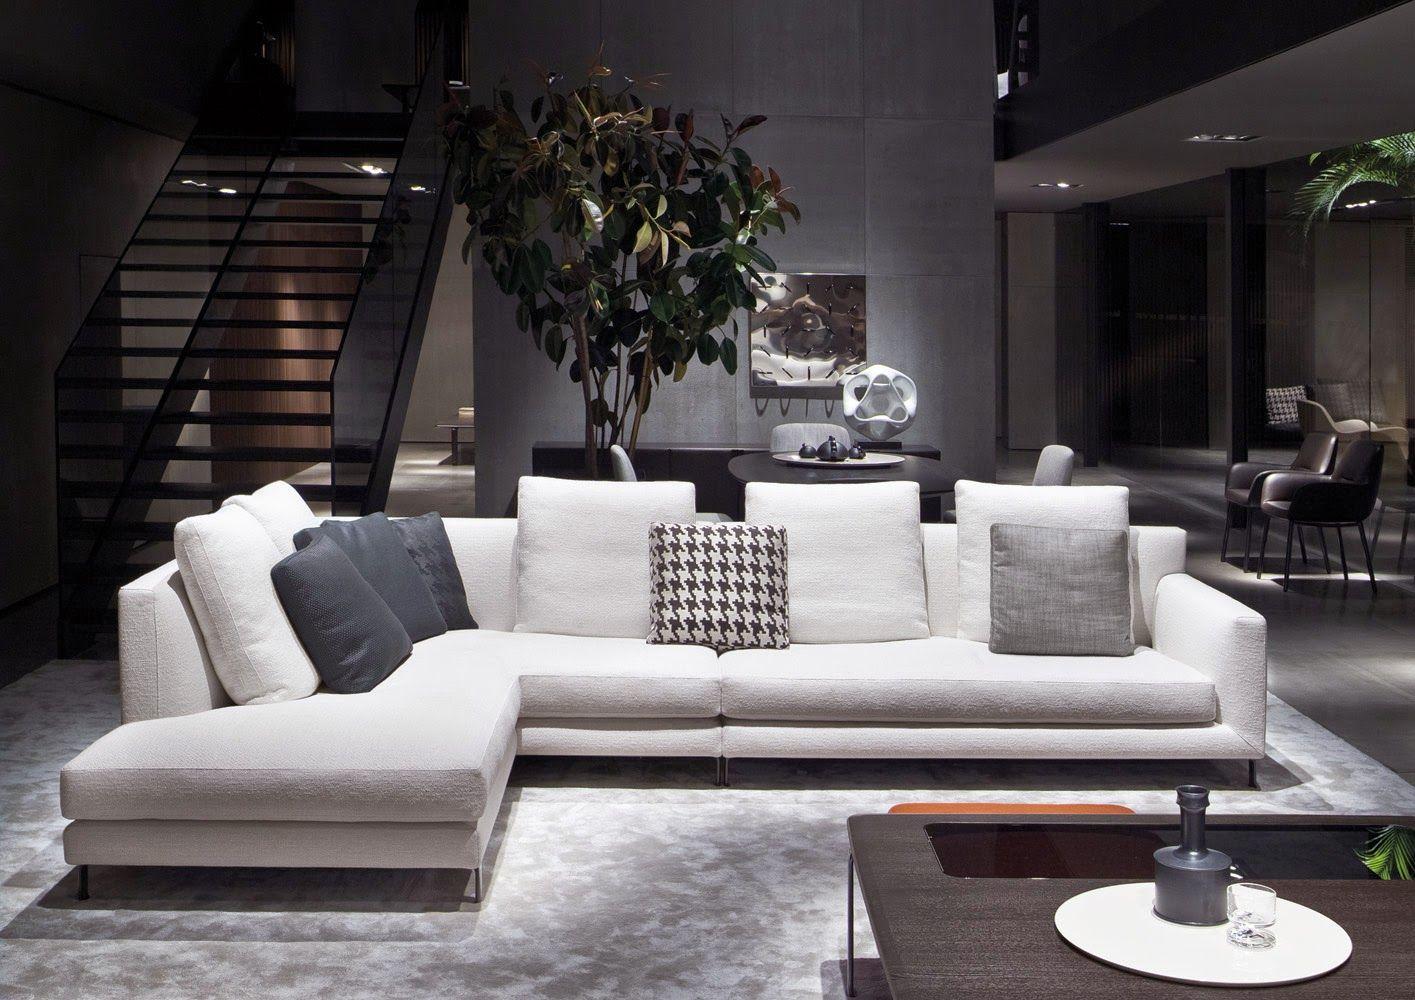 sofa modernos 2017 camel back decorating ideas decoracion salas menos es mas pinterest sofá